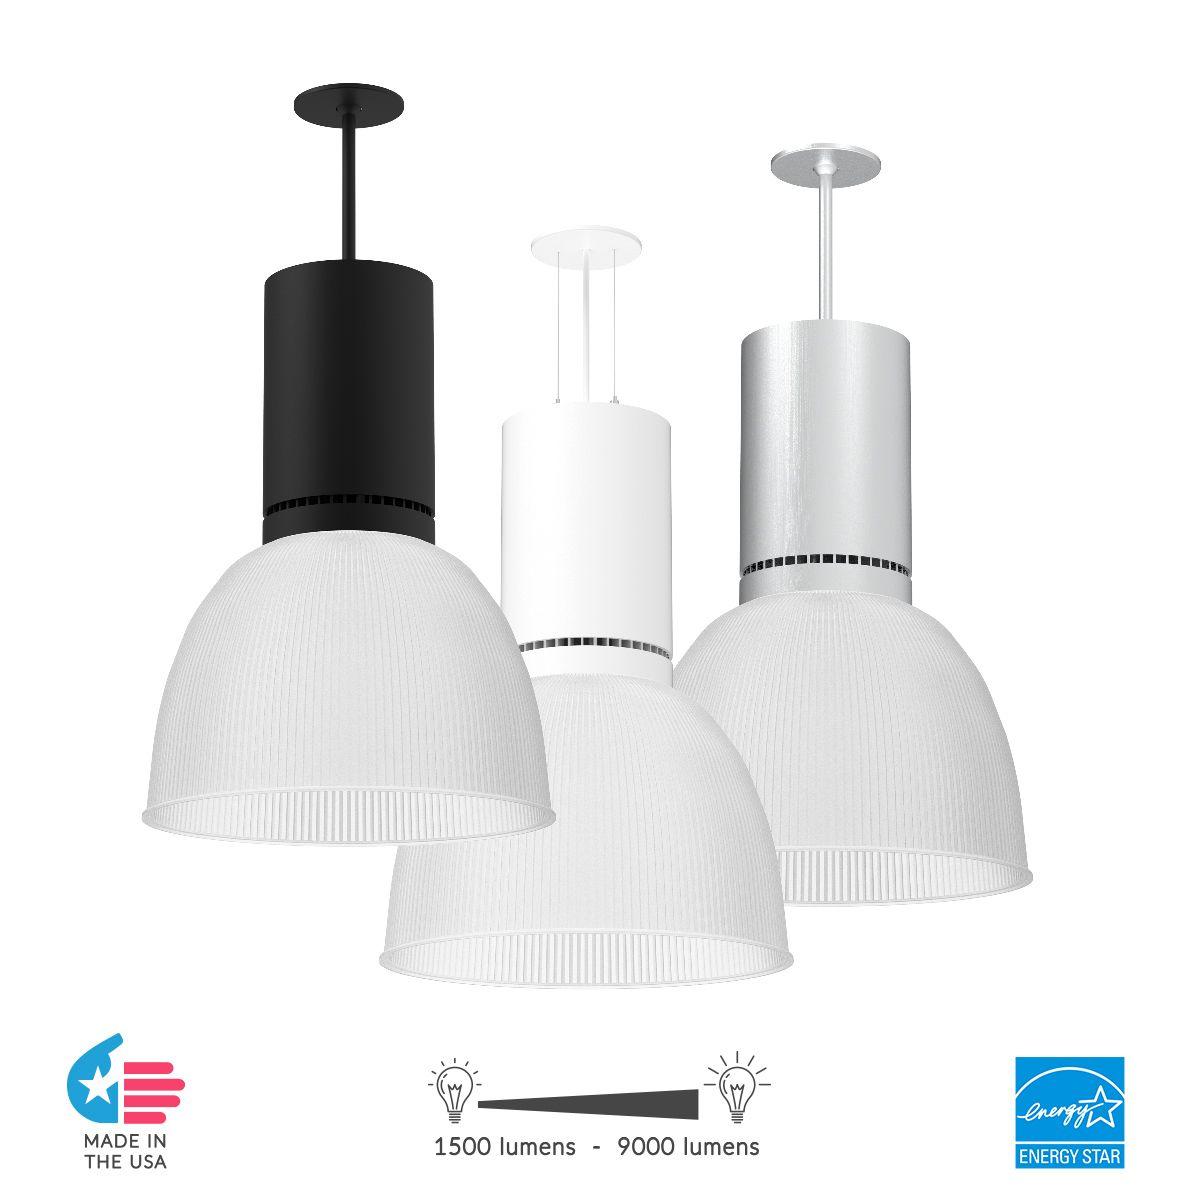 alcon lighting 80121 veria led round high bay commercial lighting pendant